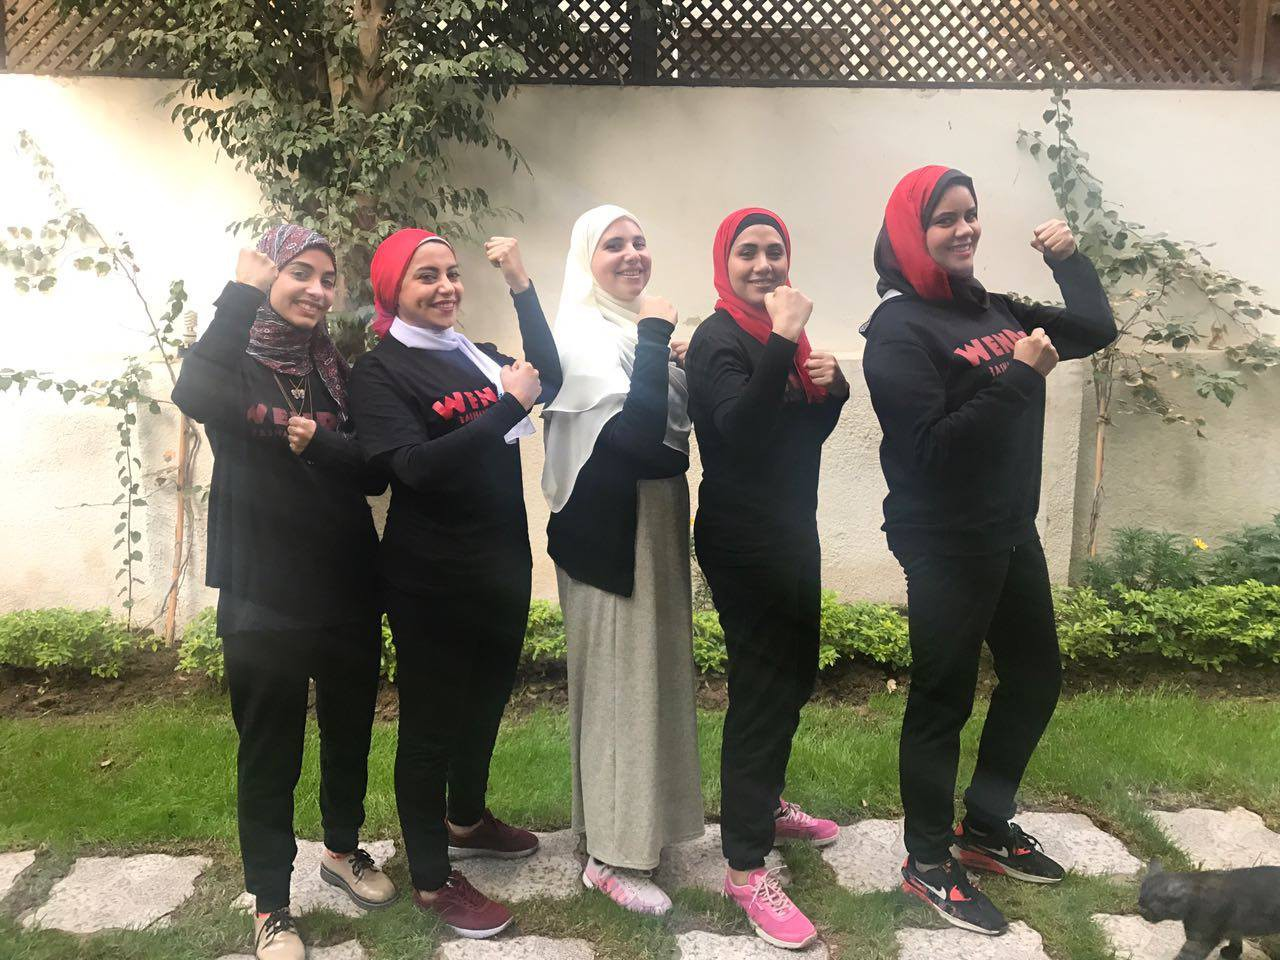 Wen-Do Trainers from Left to Right: Alaa, Maysoun, Manal, Yasmin, Amany